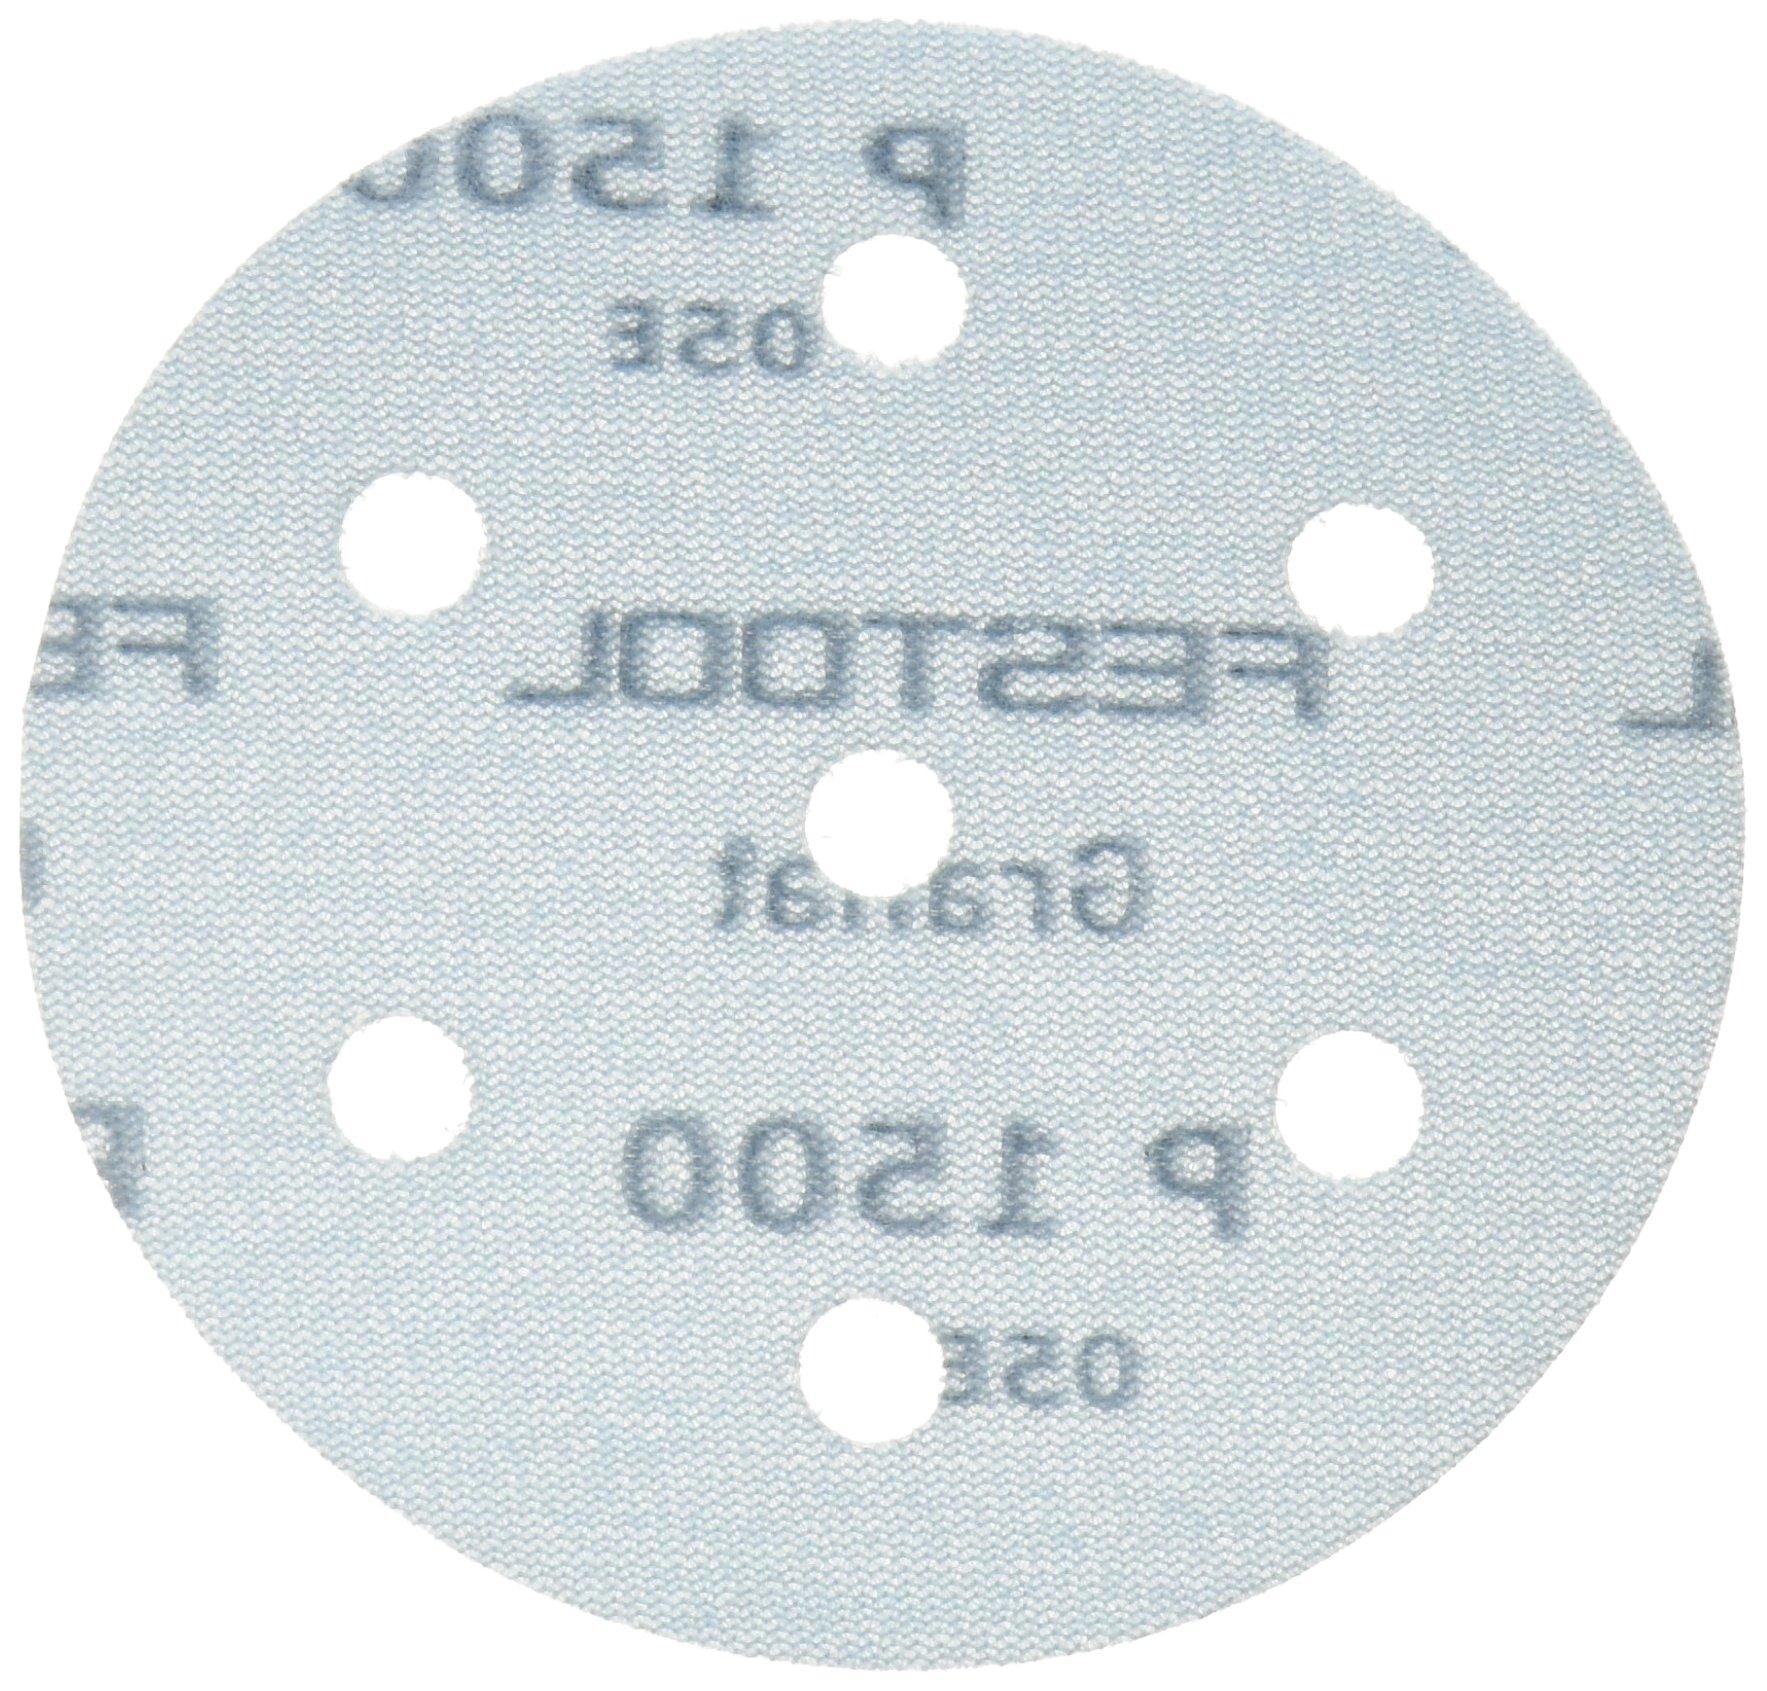 Festool 498330 Granat P1500 Grit Abrasives for Ro 90 Dx Sander